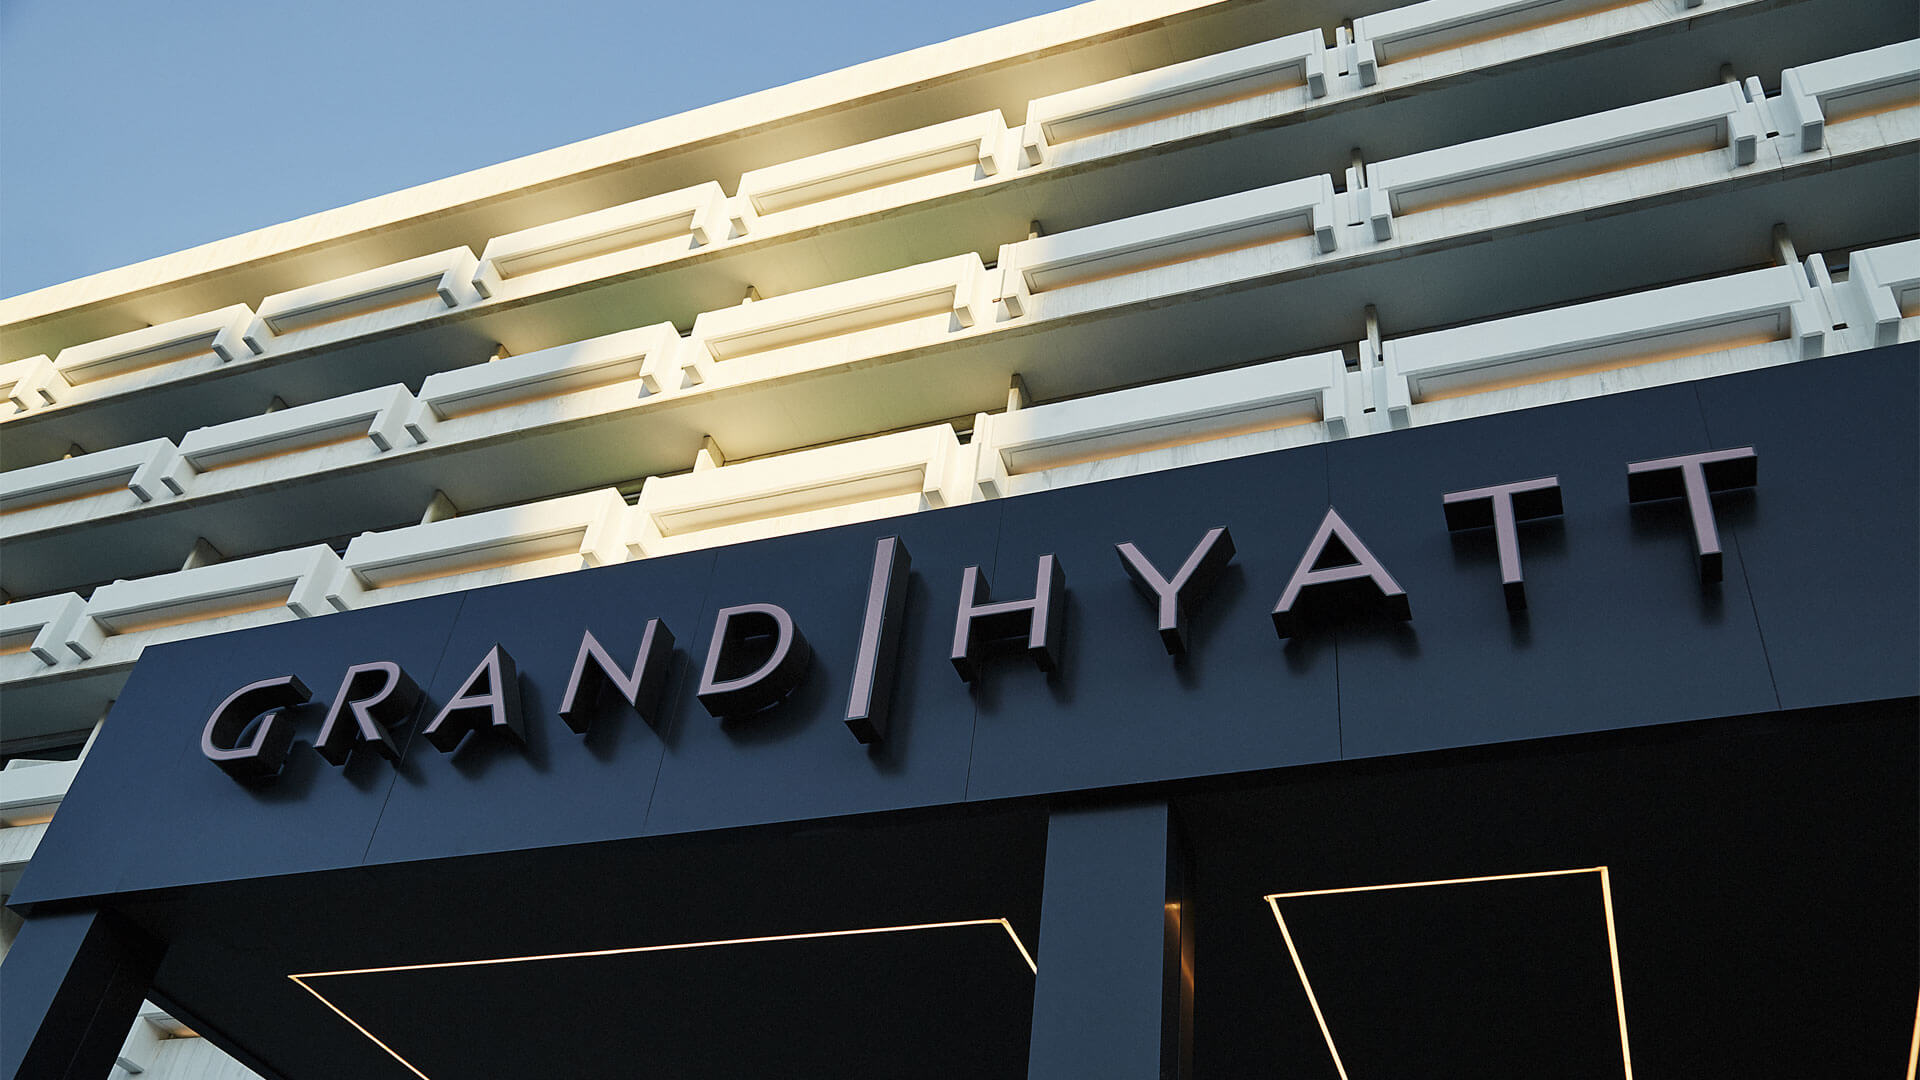 grand hyatt ξενοδοχείο